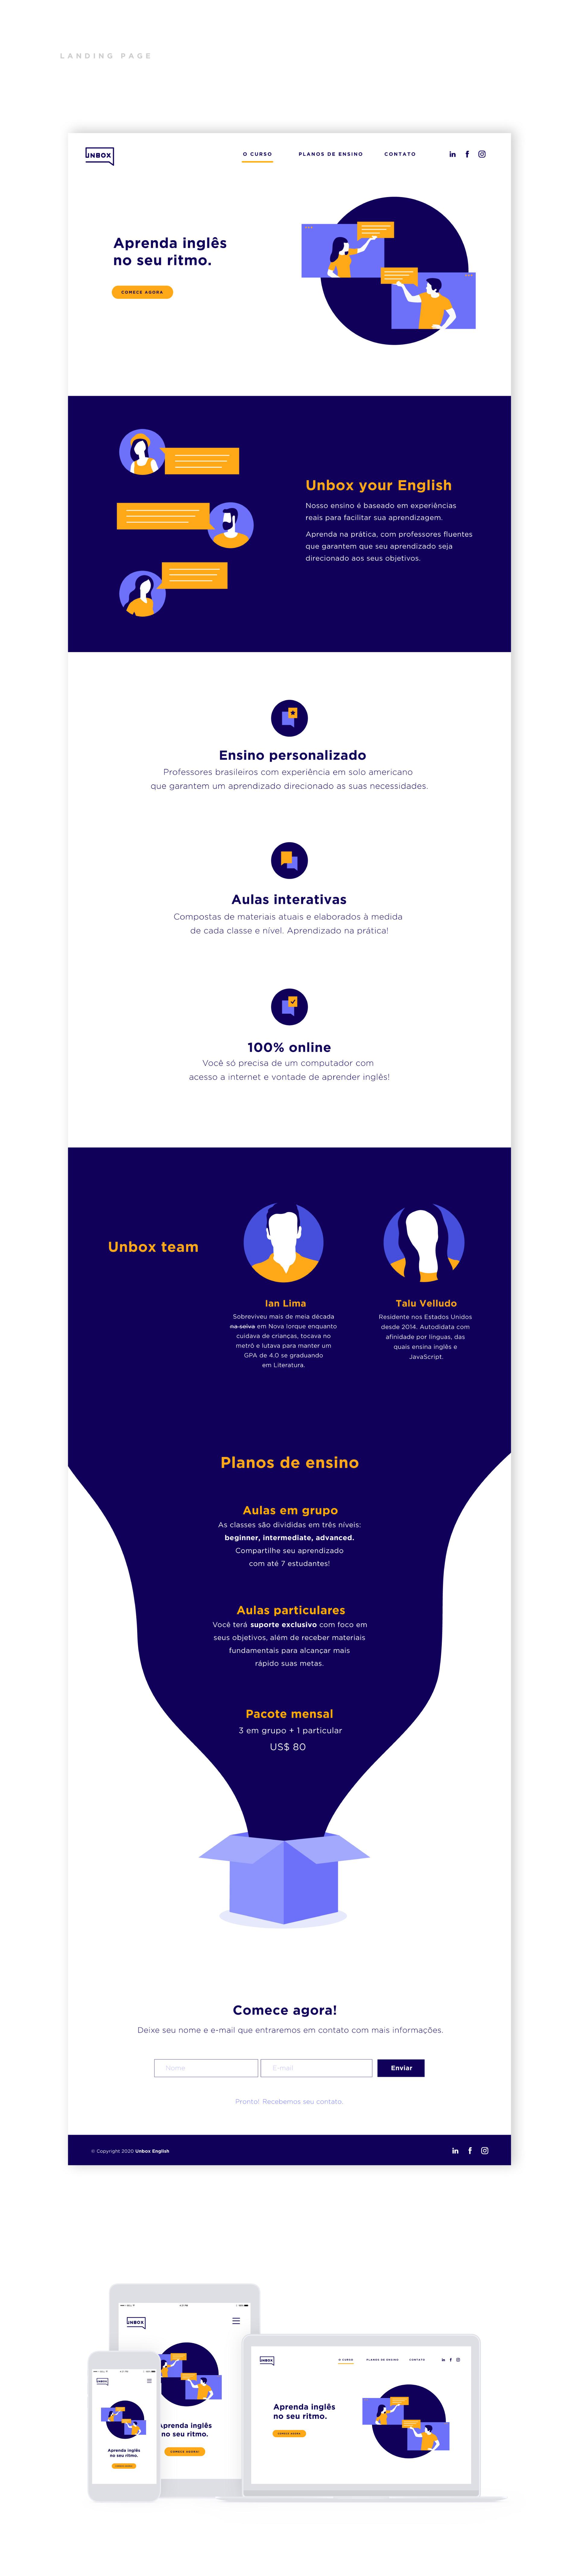 unbox-english-portifa-2.jpg